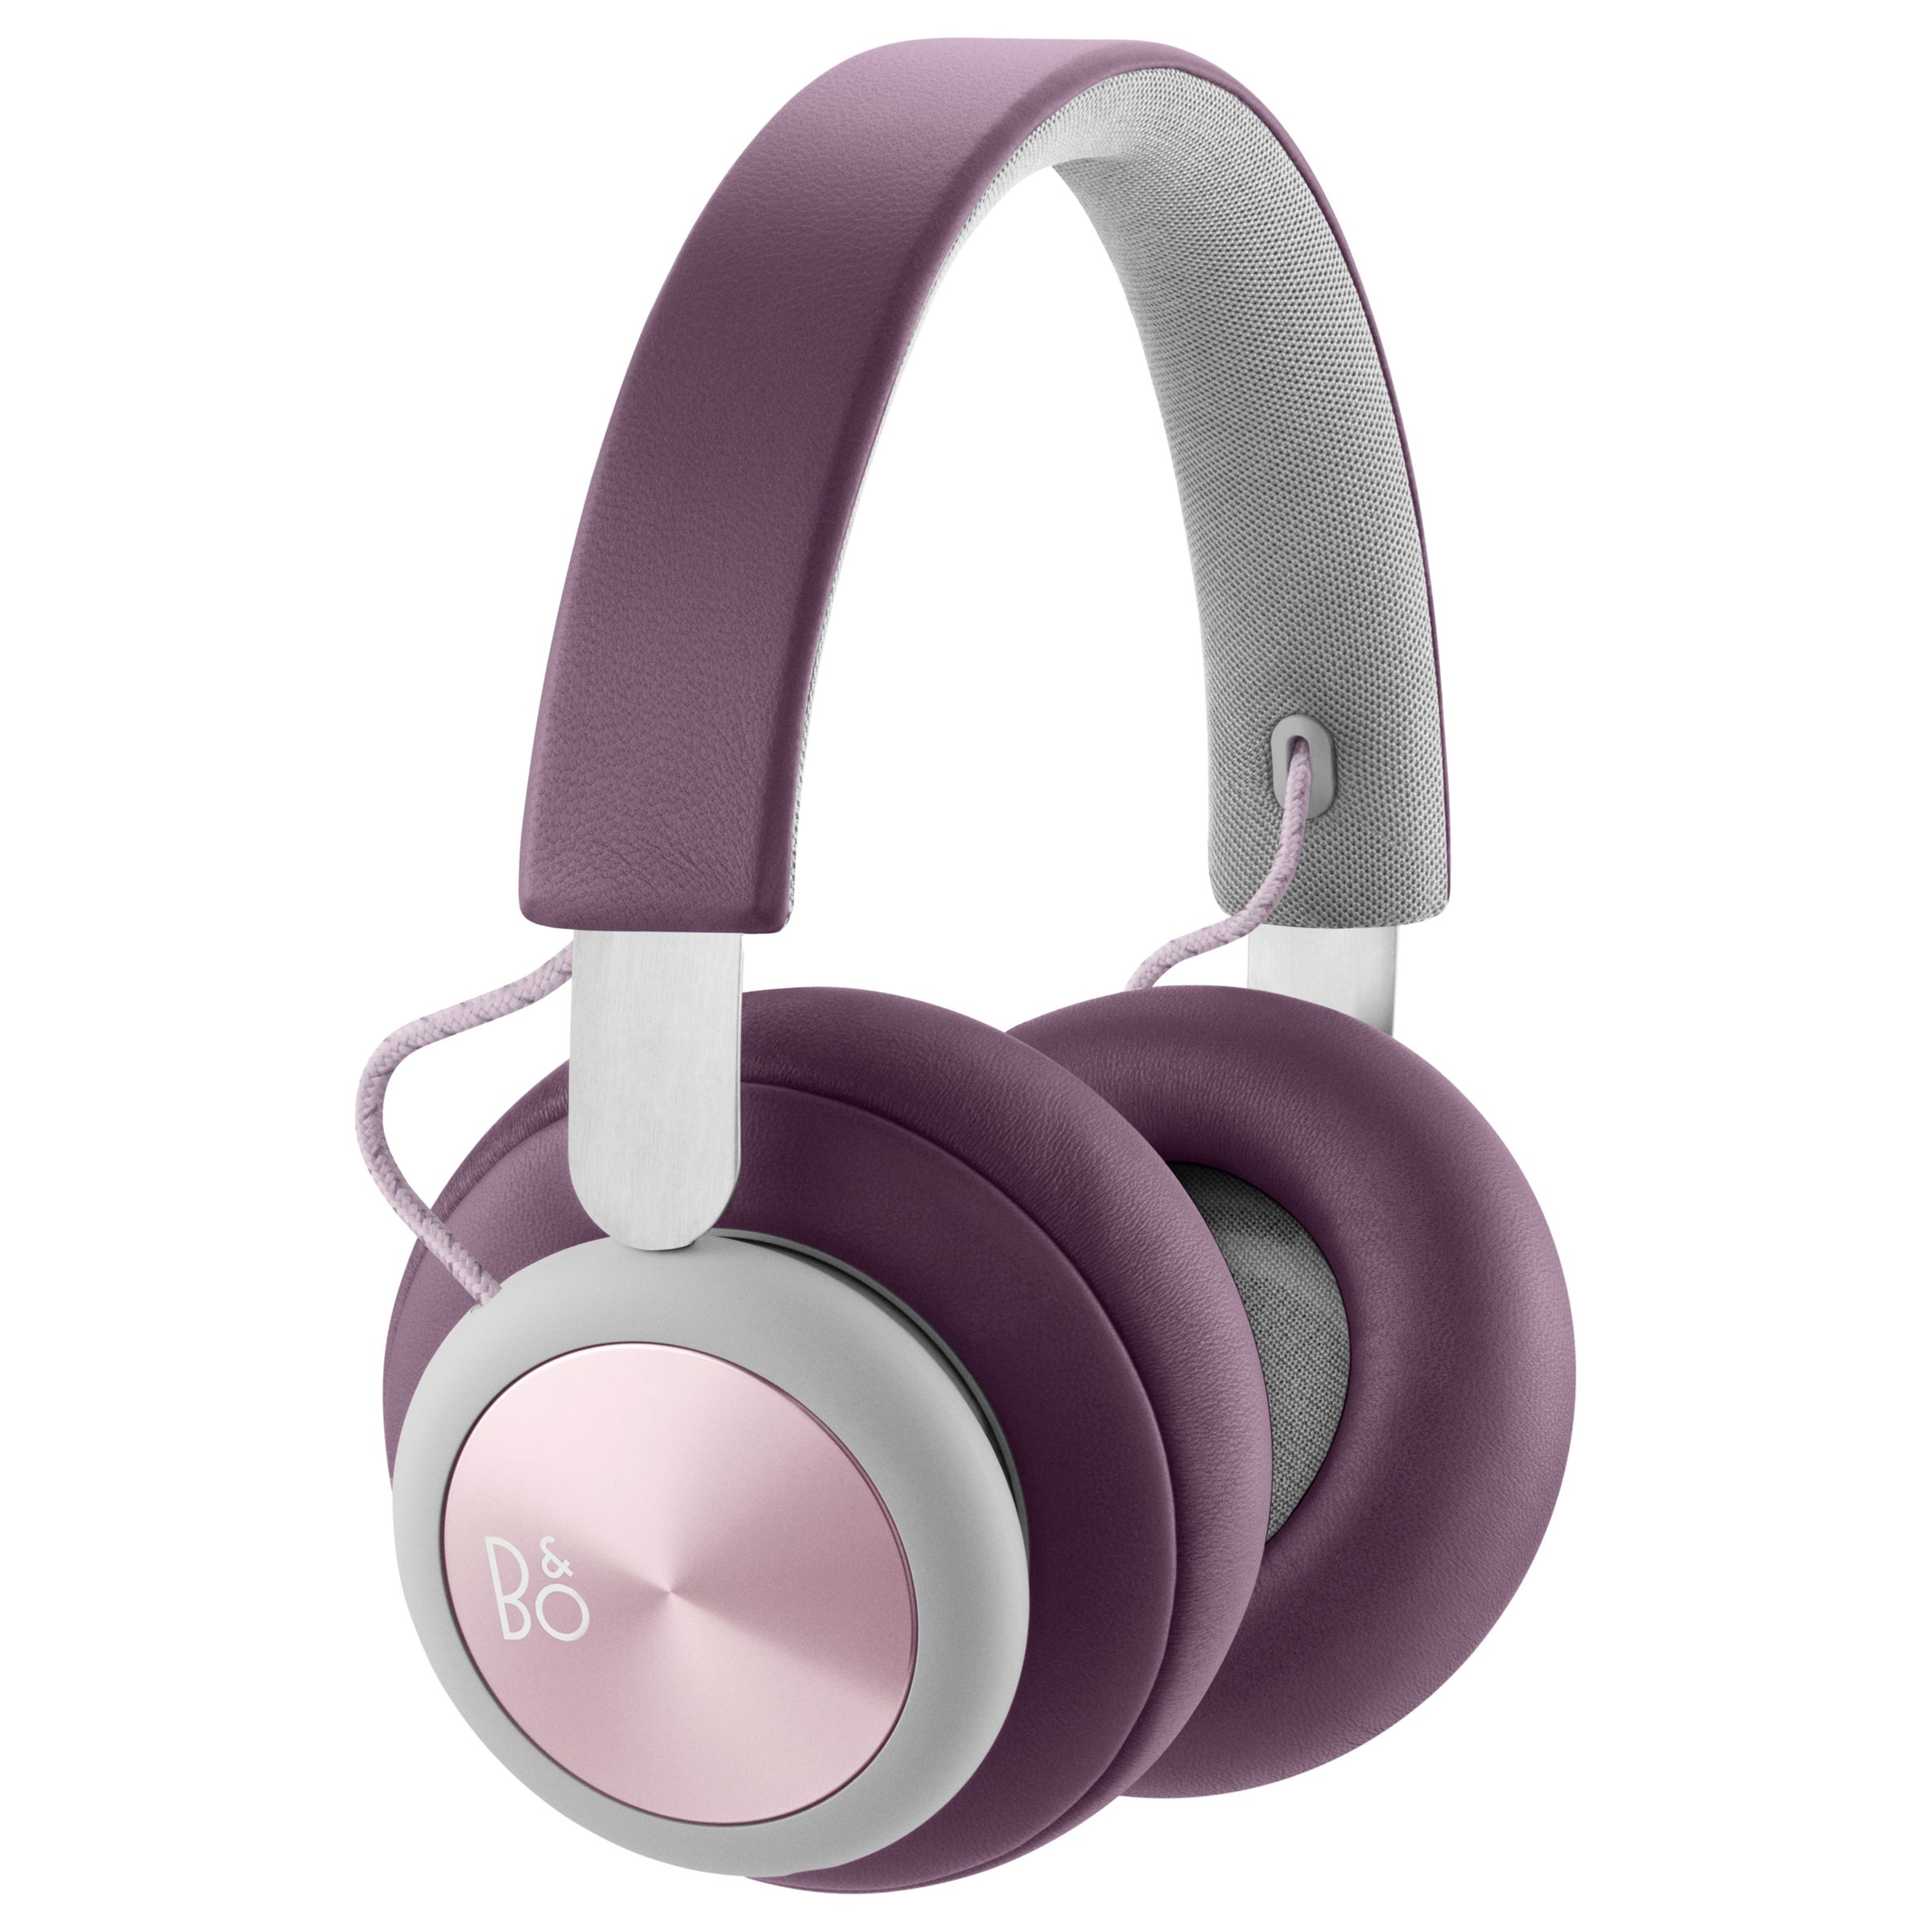 B&O PLAY Headphones